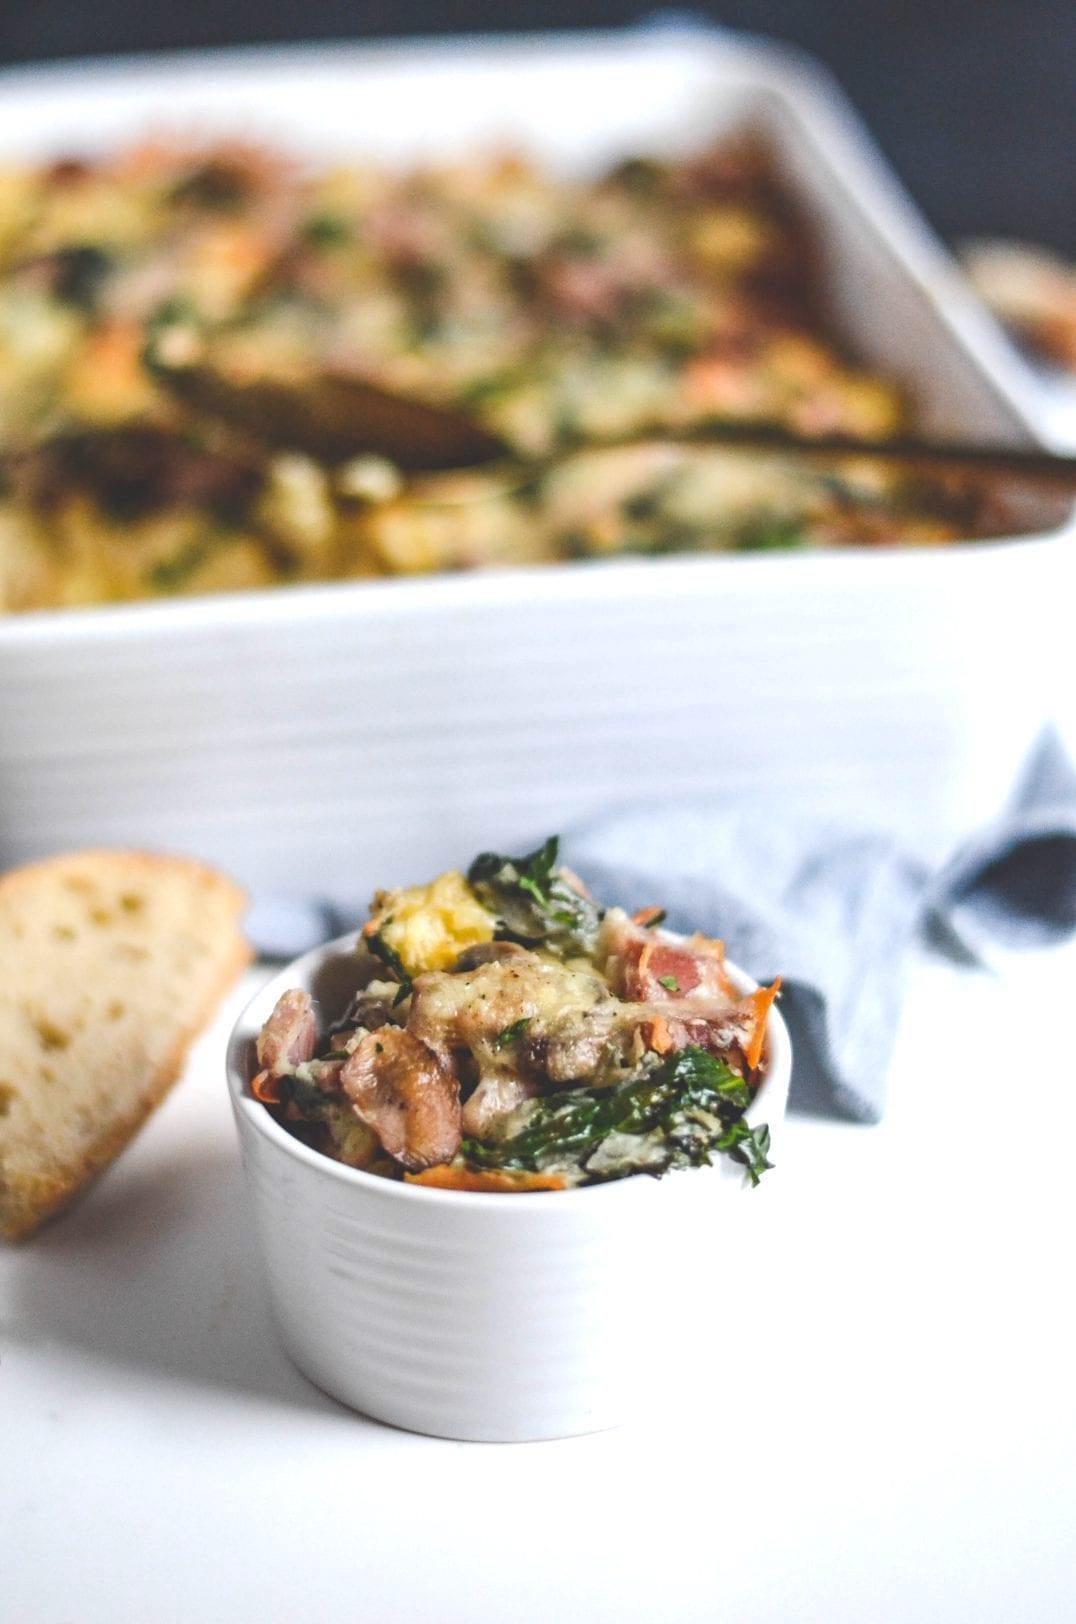 ham, spinach, mushroom, strata in a casserole dish